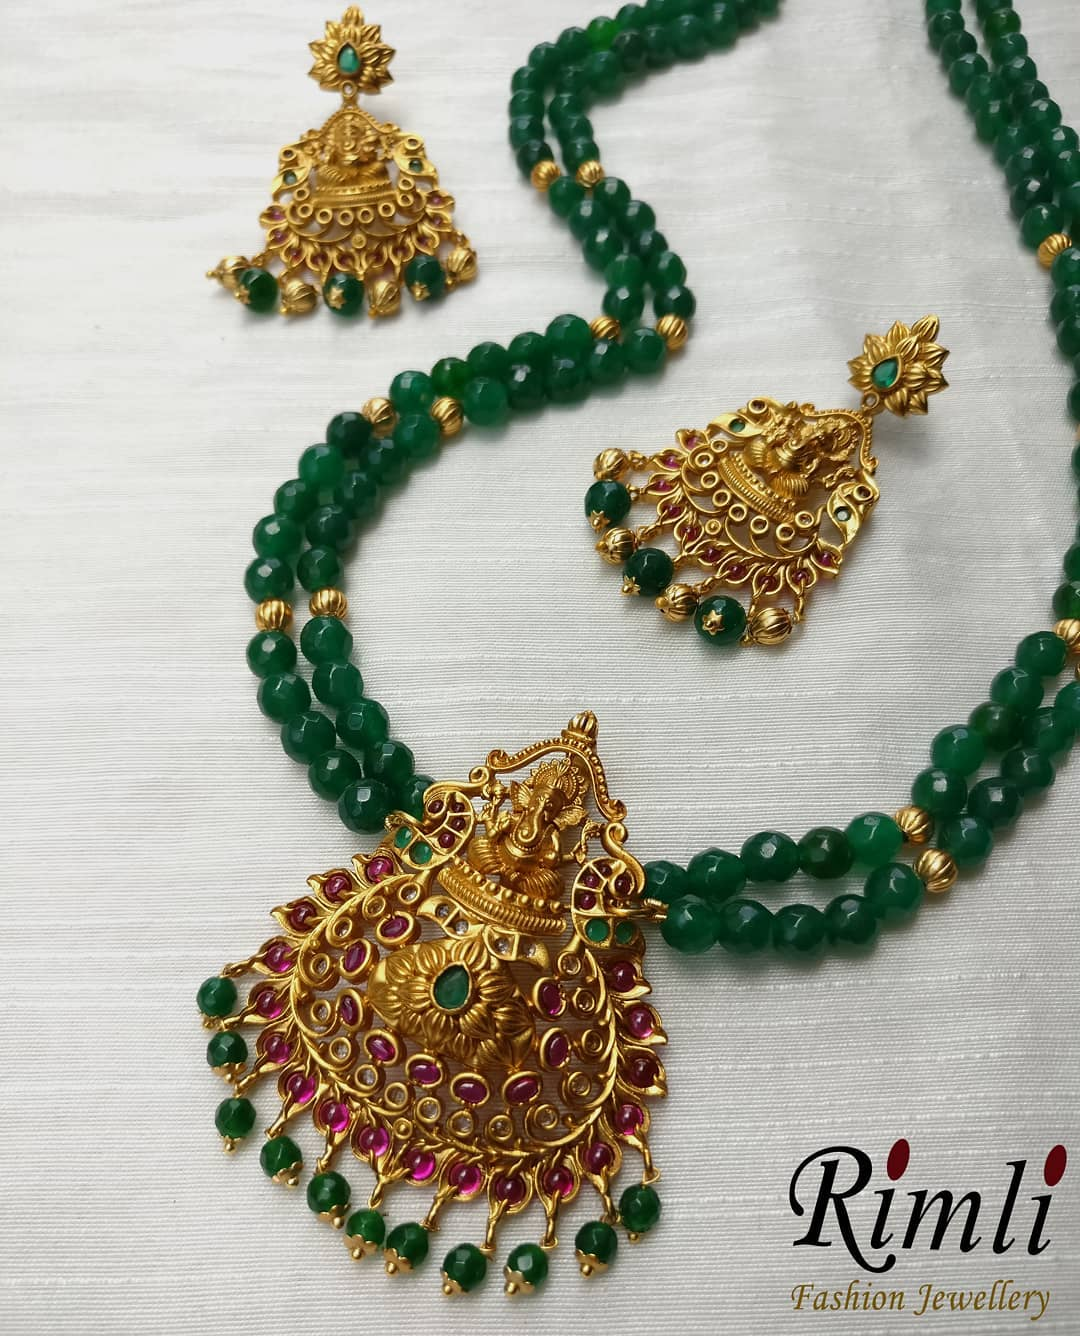 Precious Ganesa Necklace From Rimli Boutique